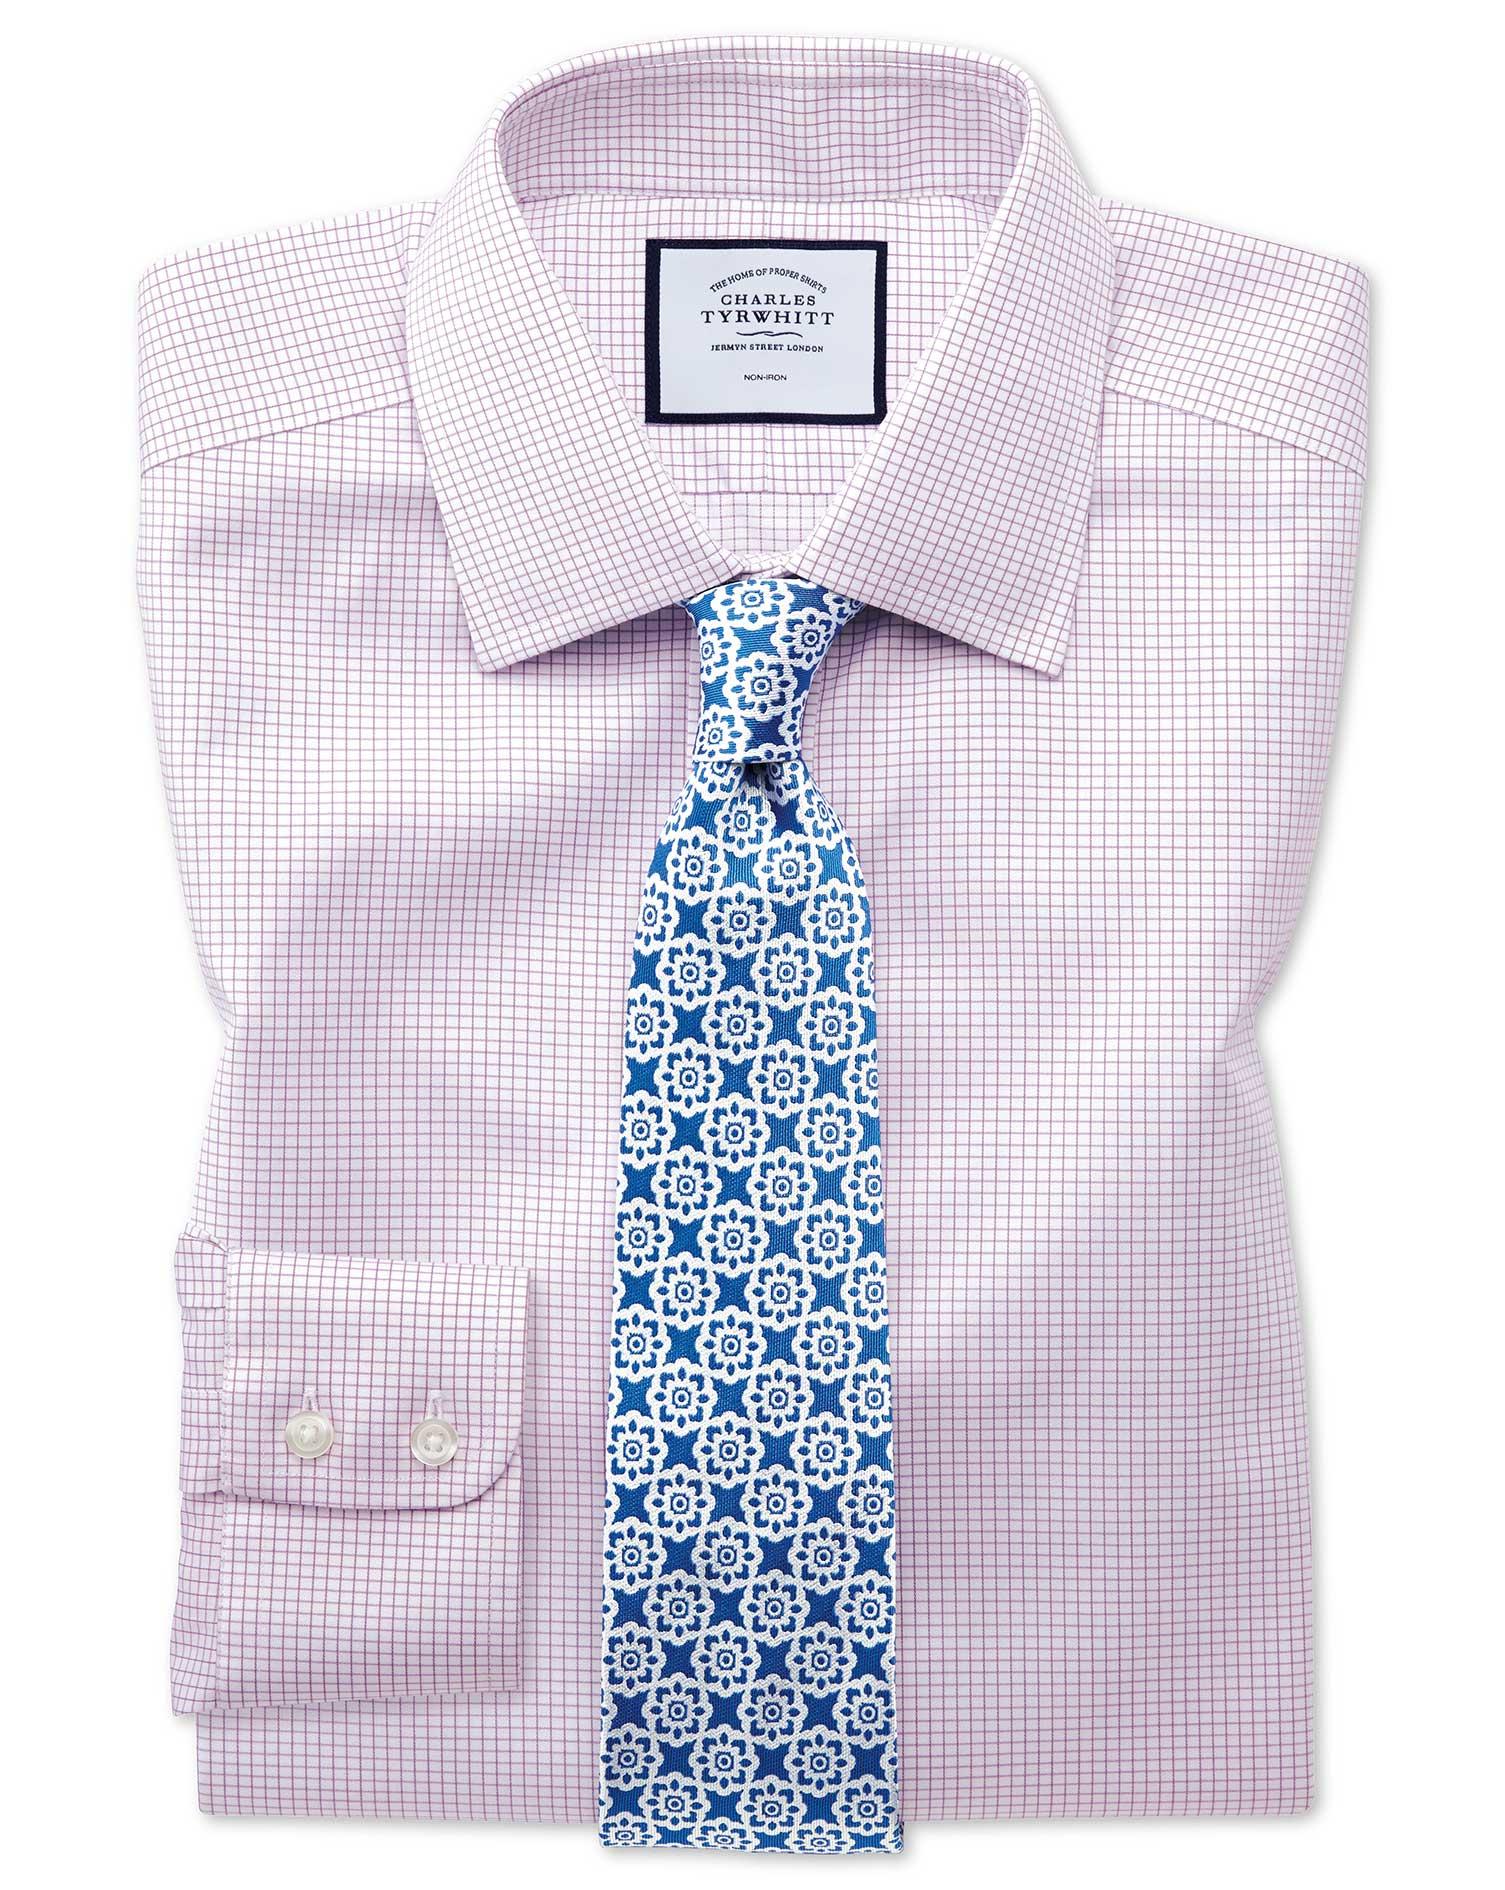 Extra Slim Fit Non-Iron Twill Mini Grid Check Purple Cotton Formal Shirt Single Cuff Size 15.5/35 by